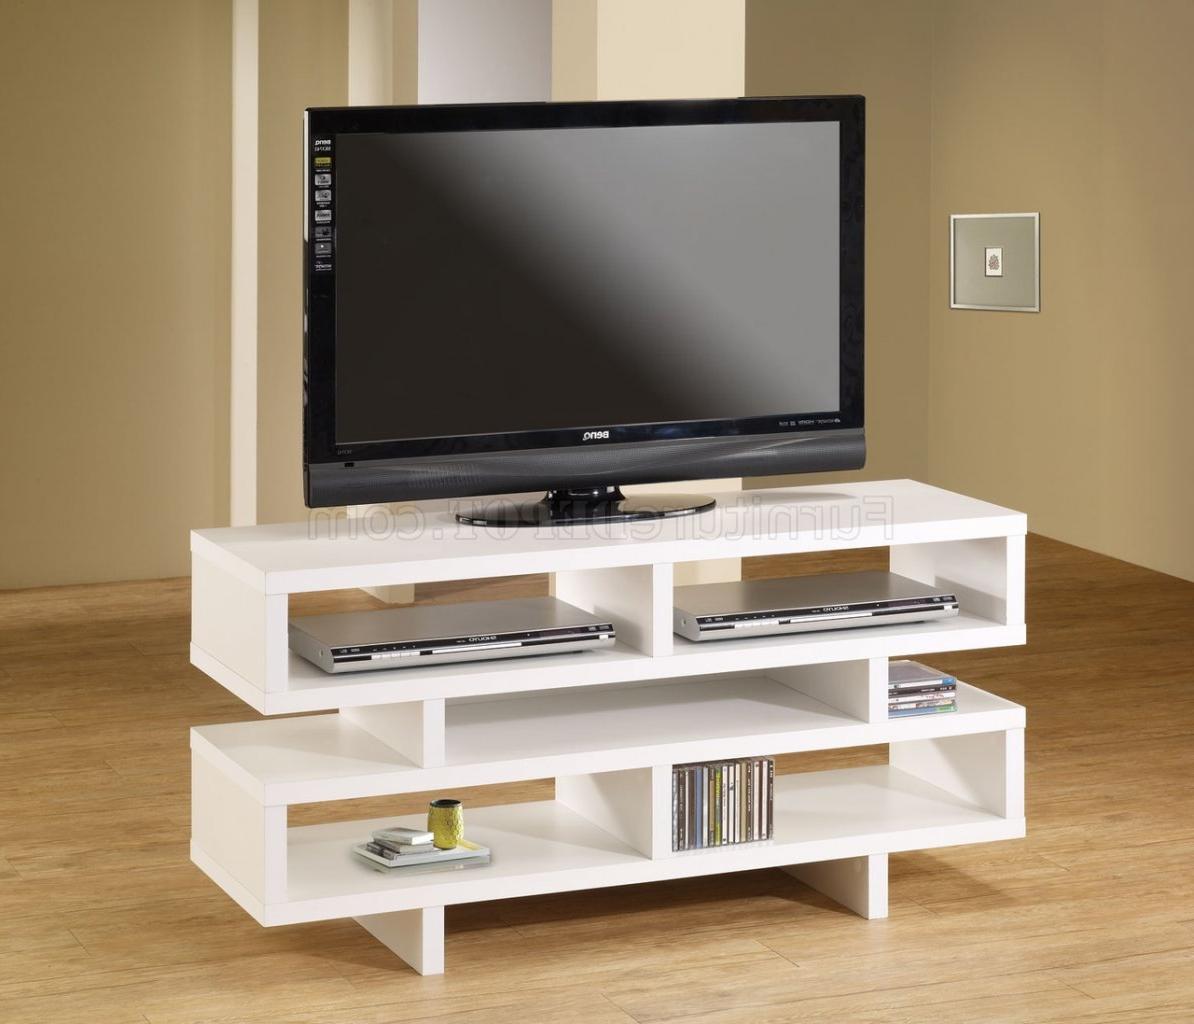 700721 Tv Stand In Whitecoaster Regarding Simple Open Storage Shelf Corner Tv Stands (View 5 of 20)